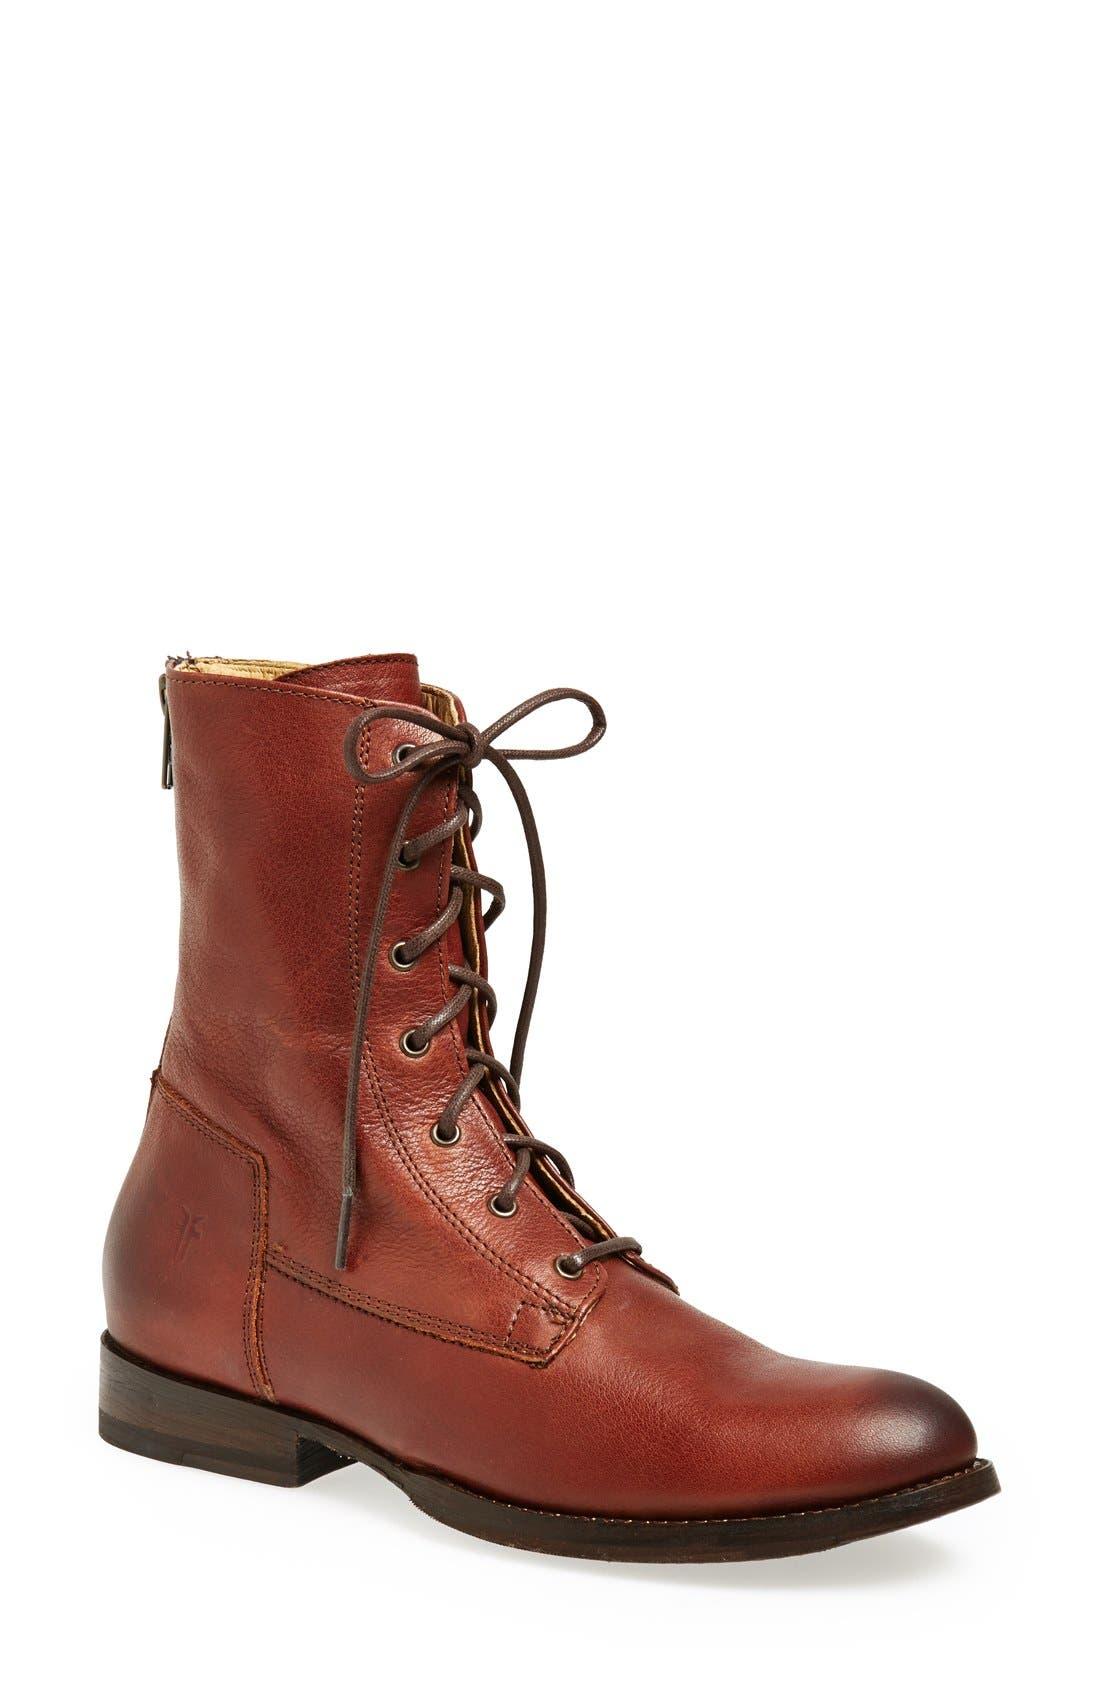 Alternate Image 1 Selected - Frye 'Jamie Artisan' Boot (Women)